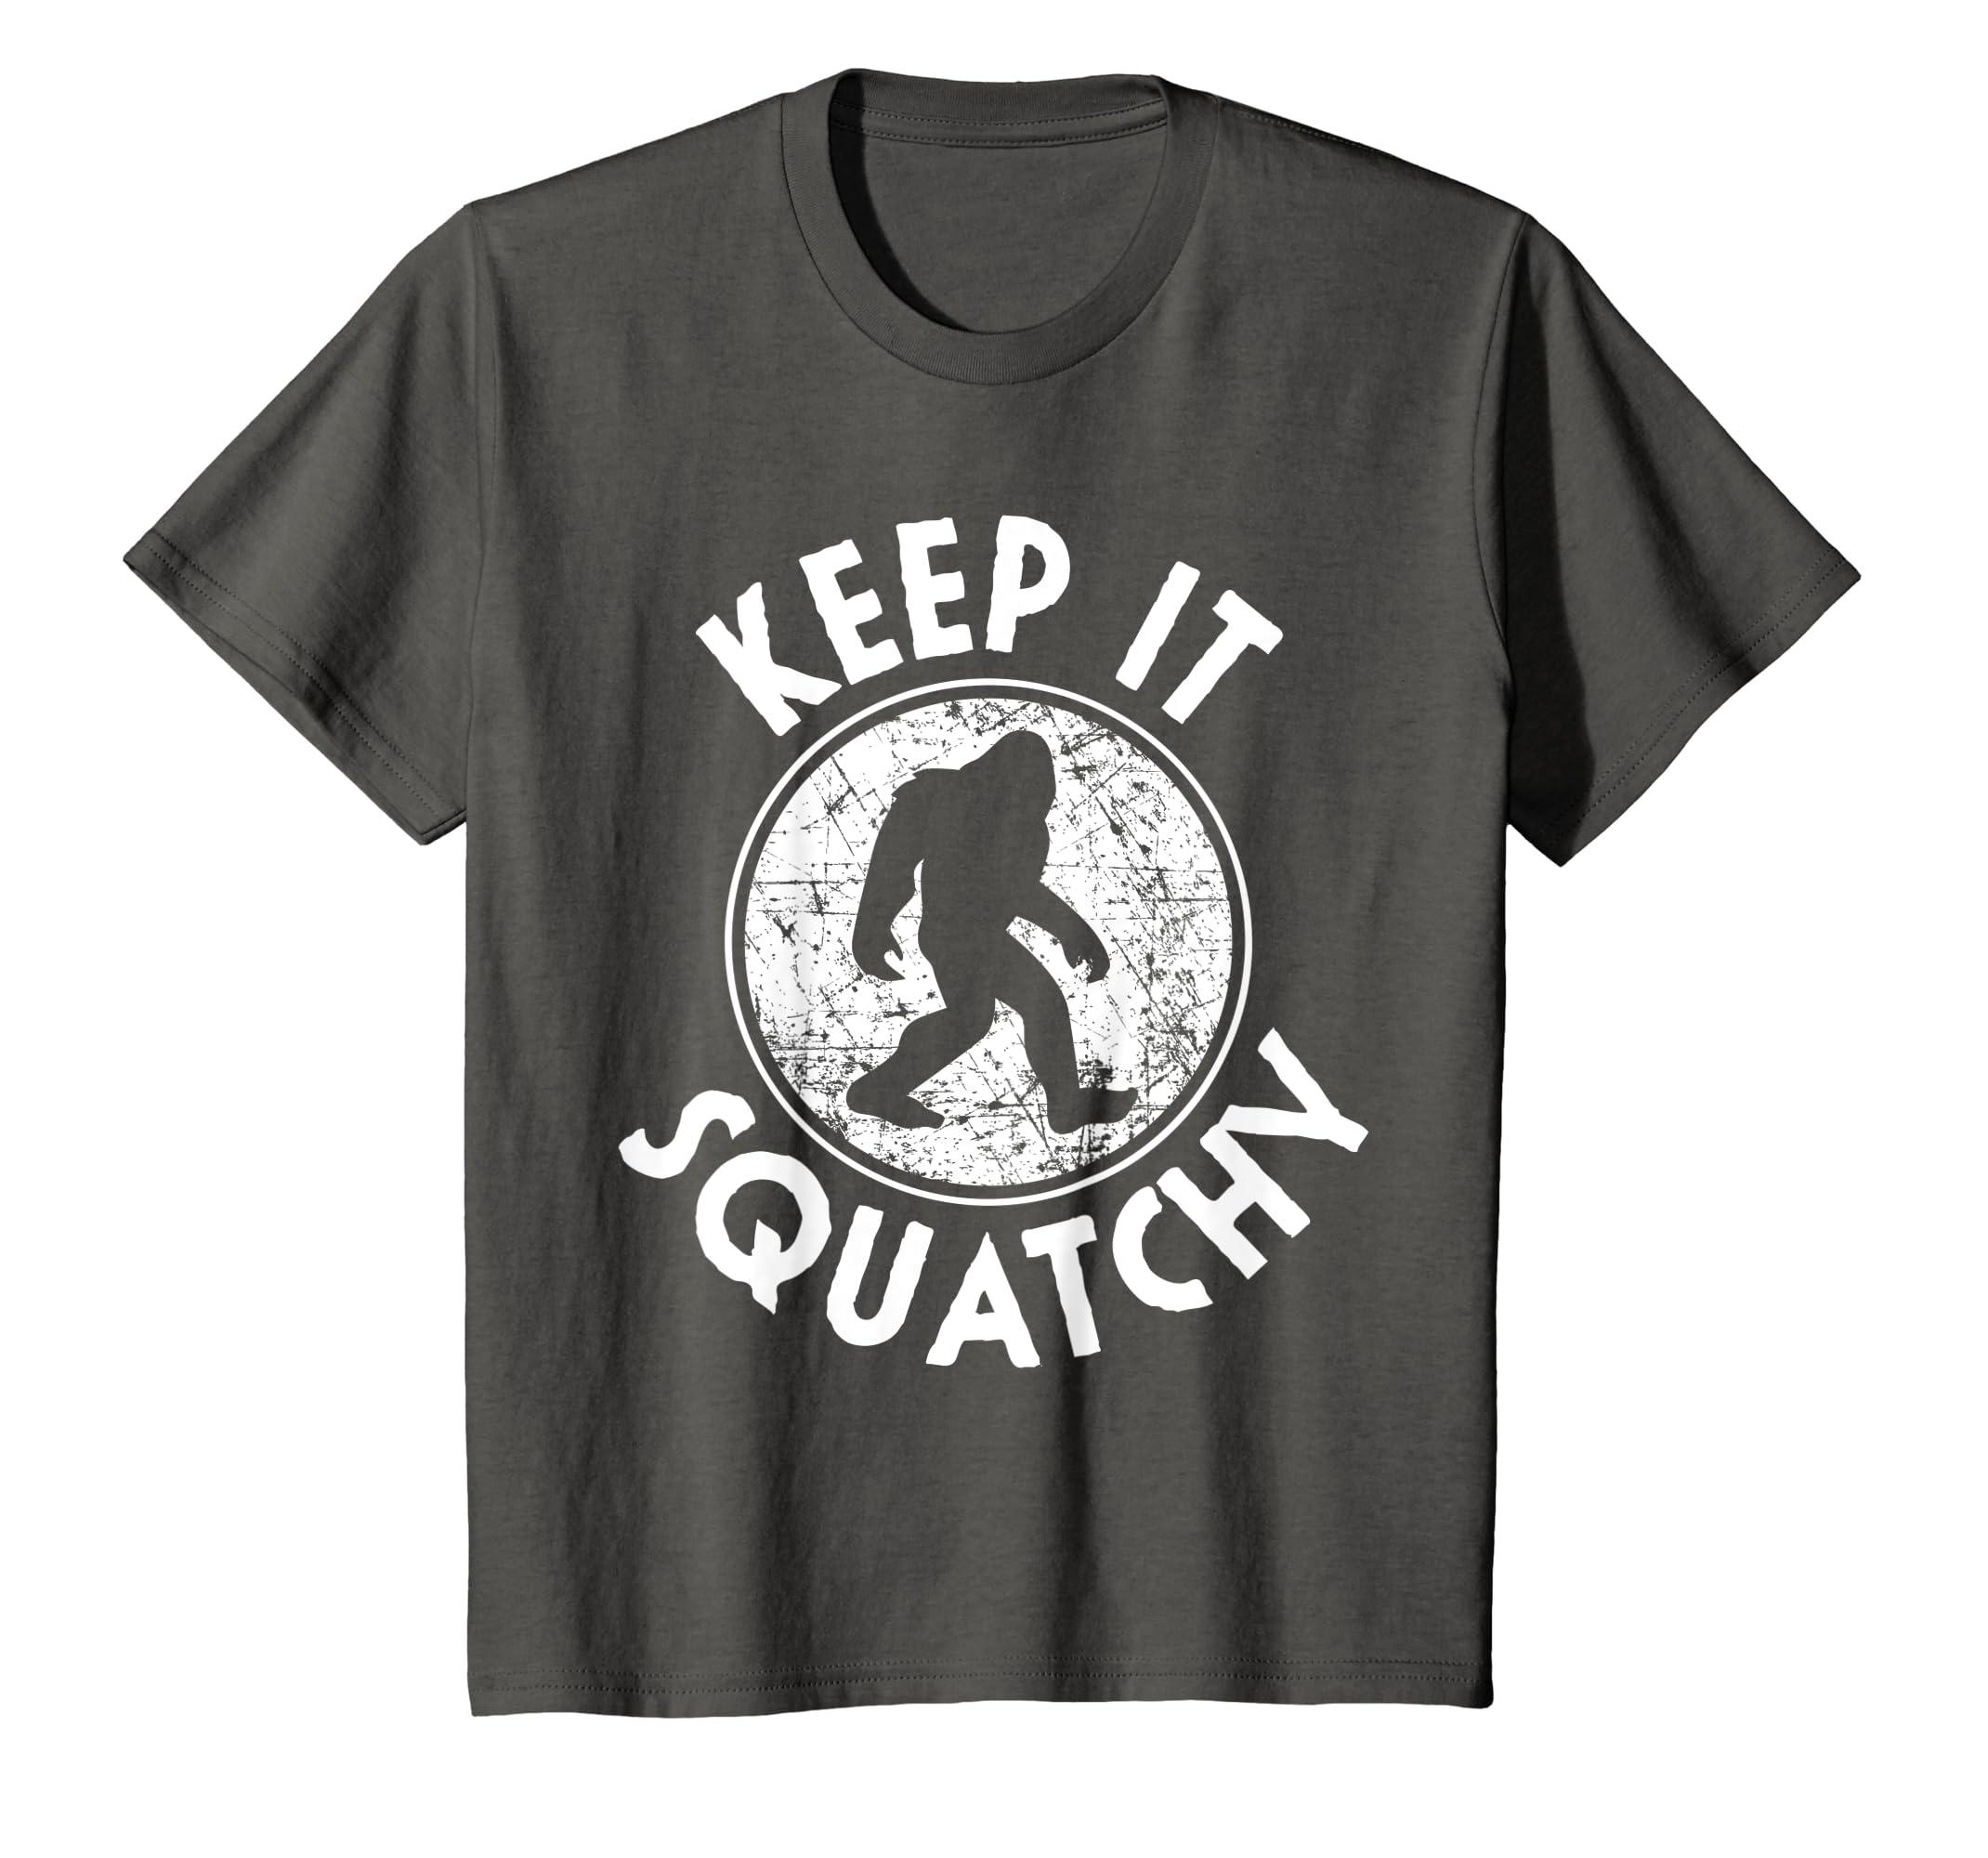 66fc50175 Amazon.com: Keep it Squatchy Bigfoot T-Shirt Funny Sasquatch Gift: Clothing